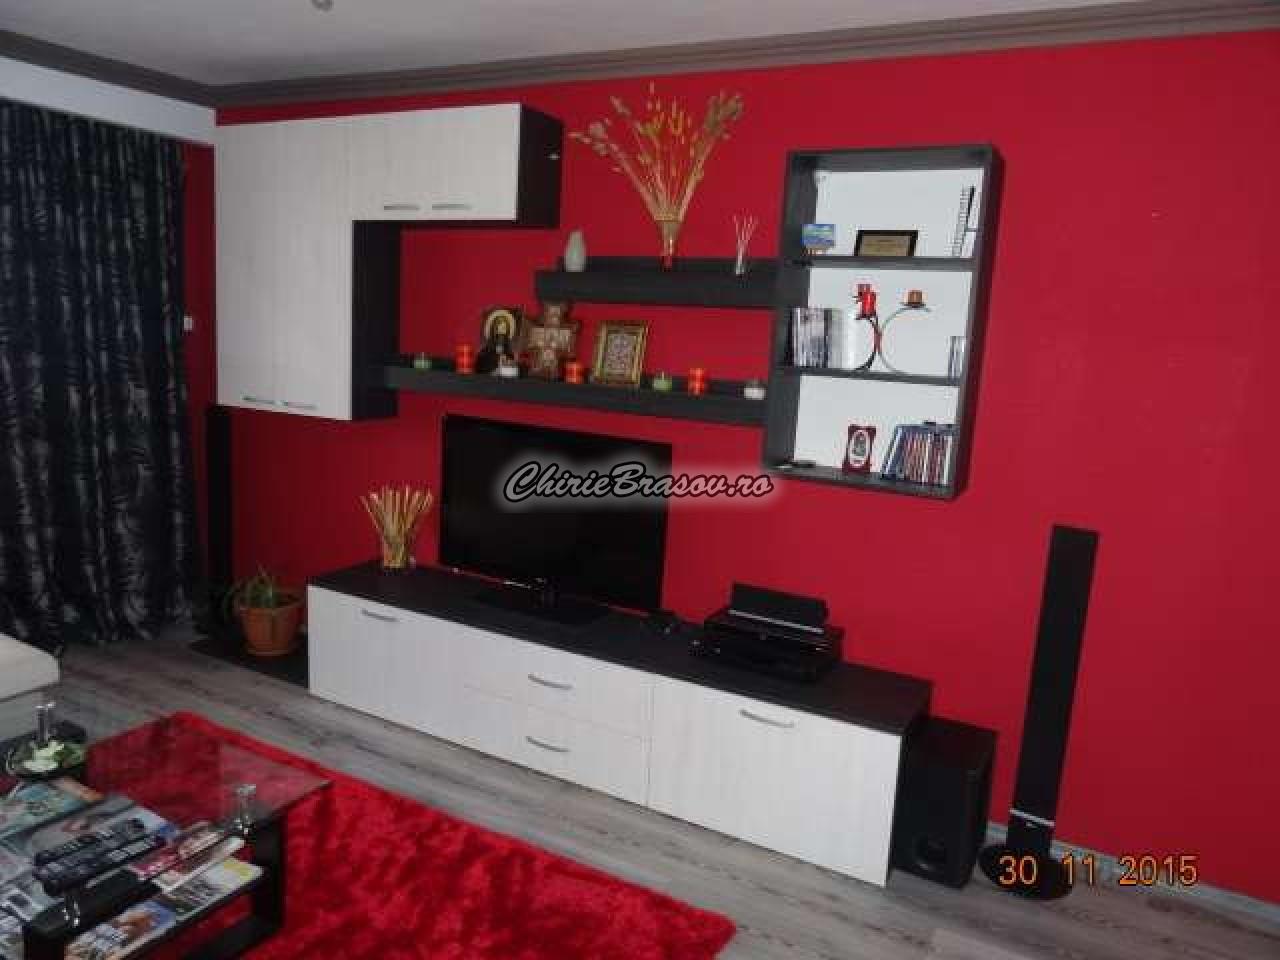 Chirie Brasov apartament 3 camere zona Grivitei-354-1